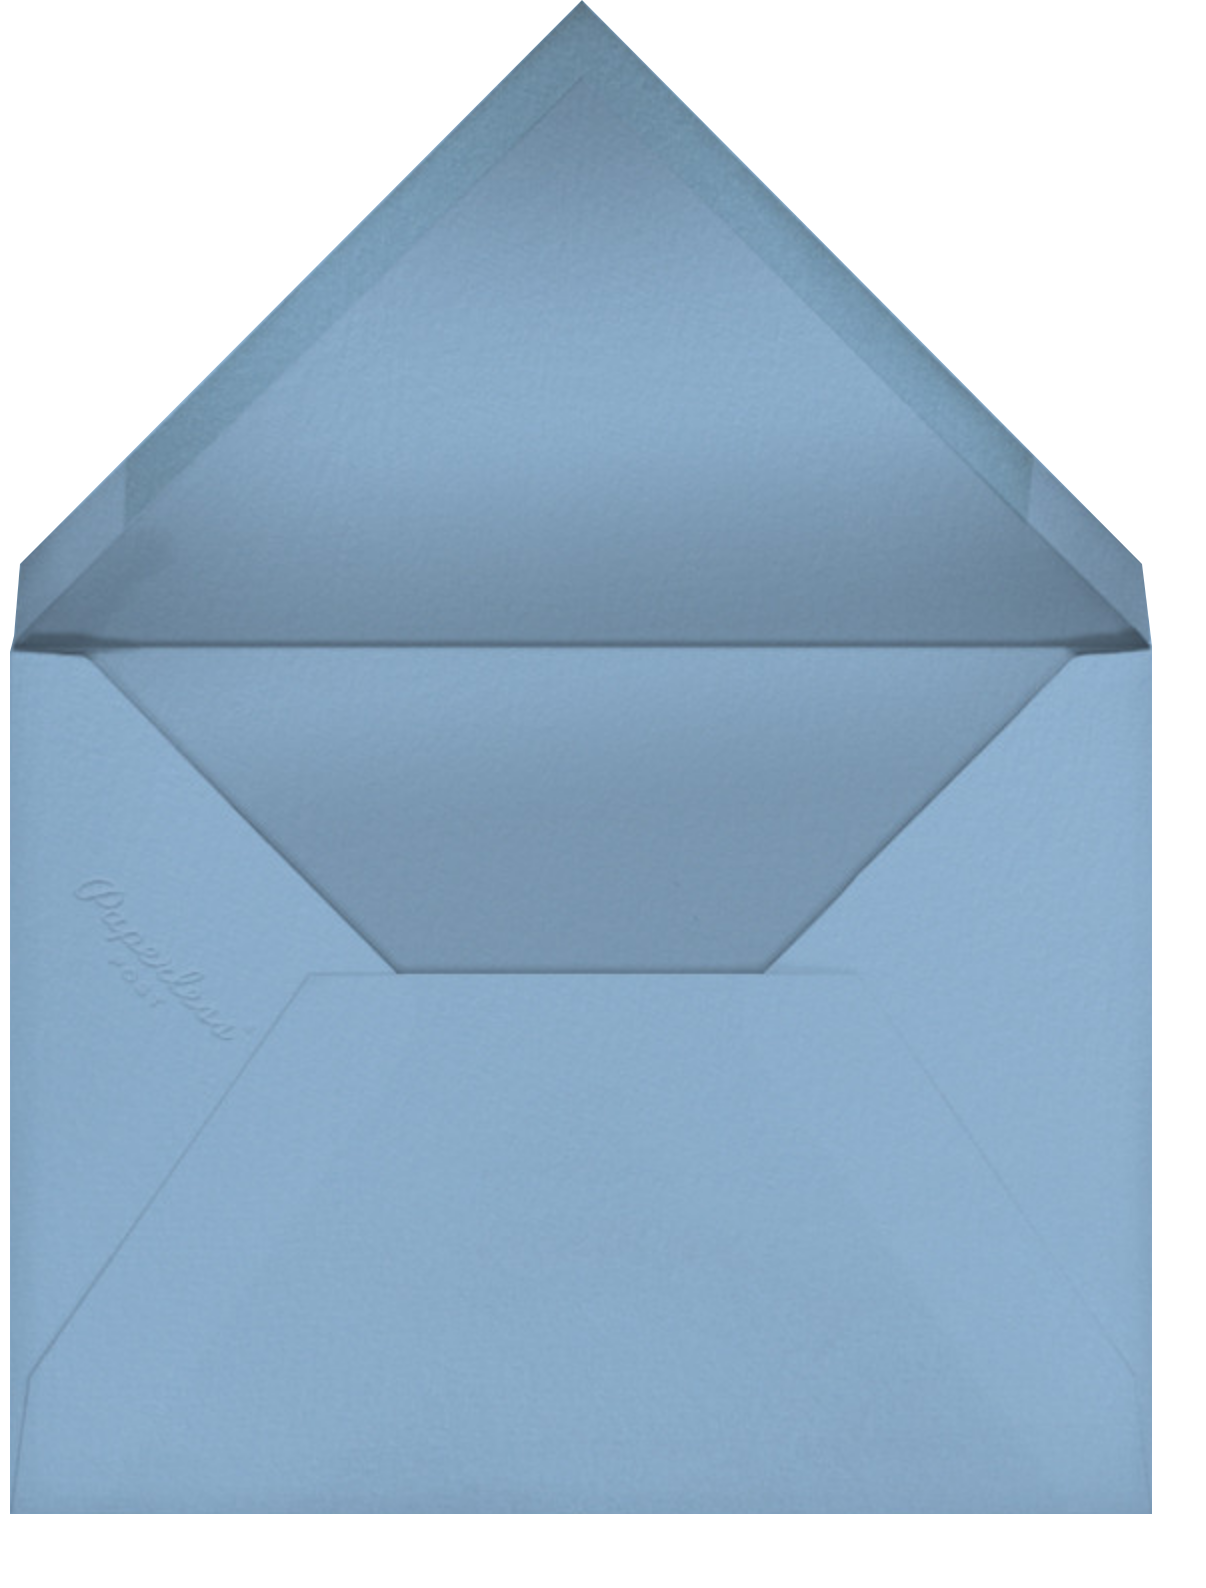 Happy Birthday Hipster - Paperless Post - Envelope